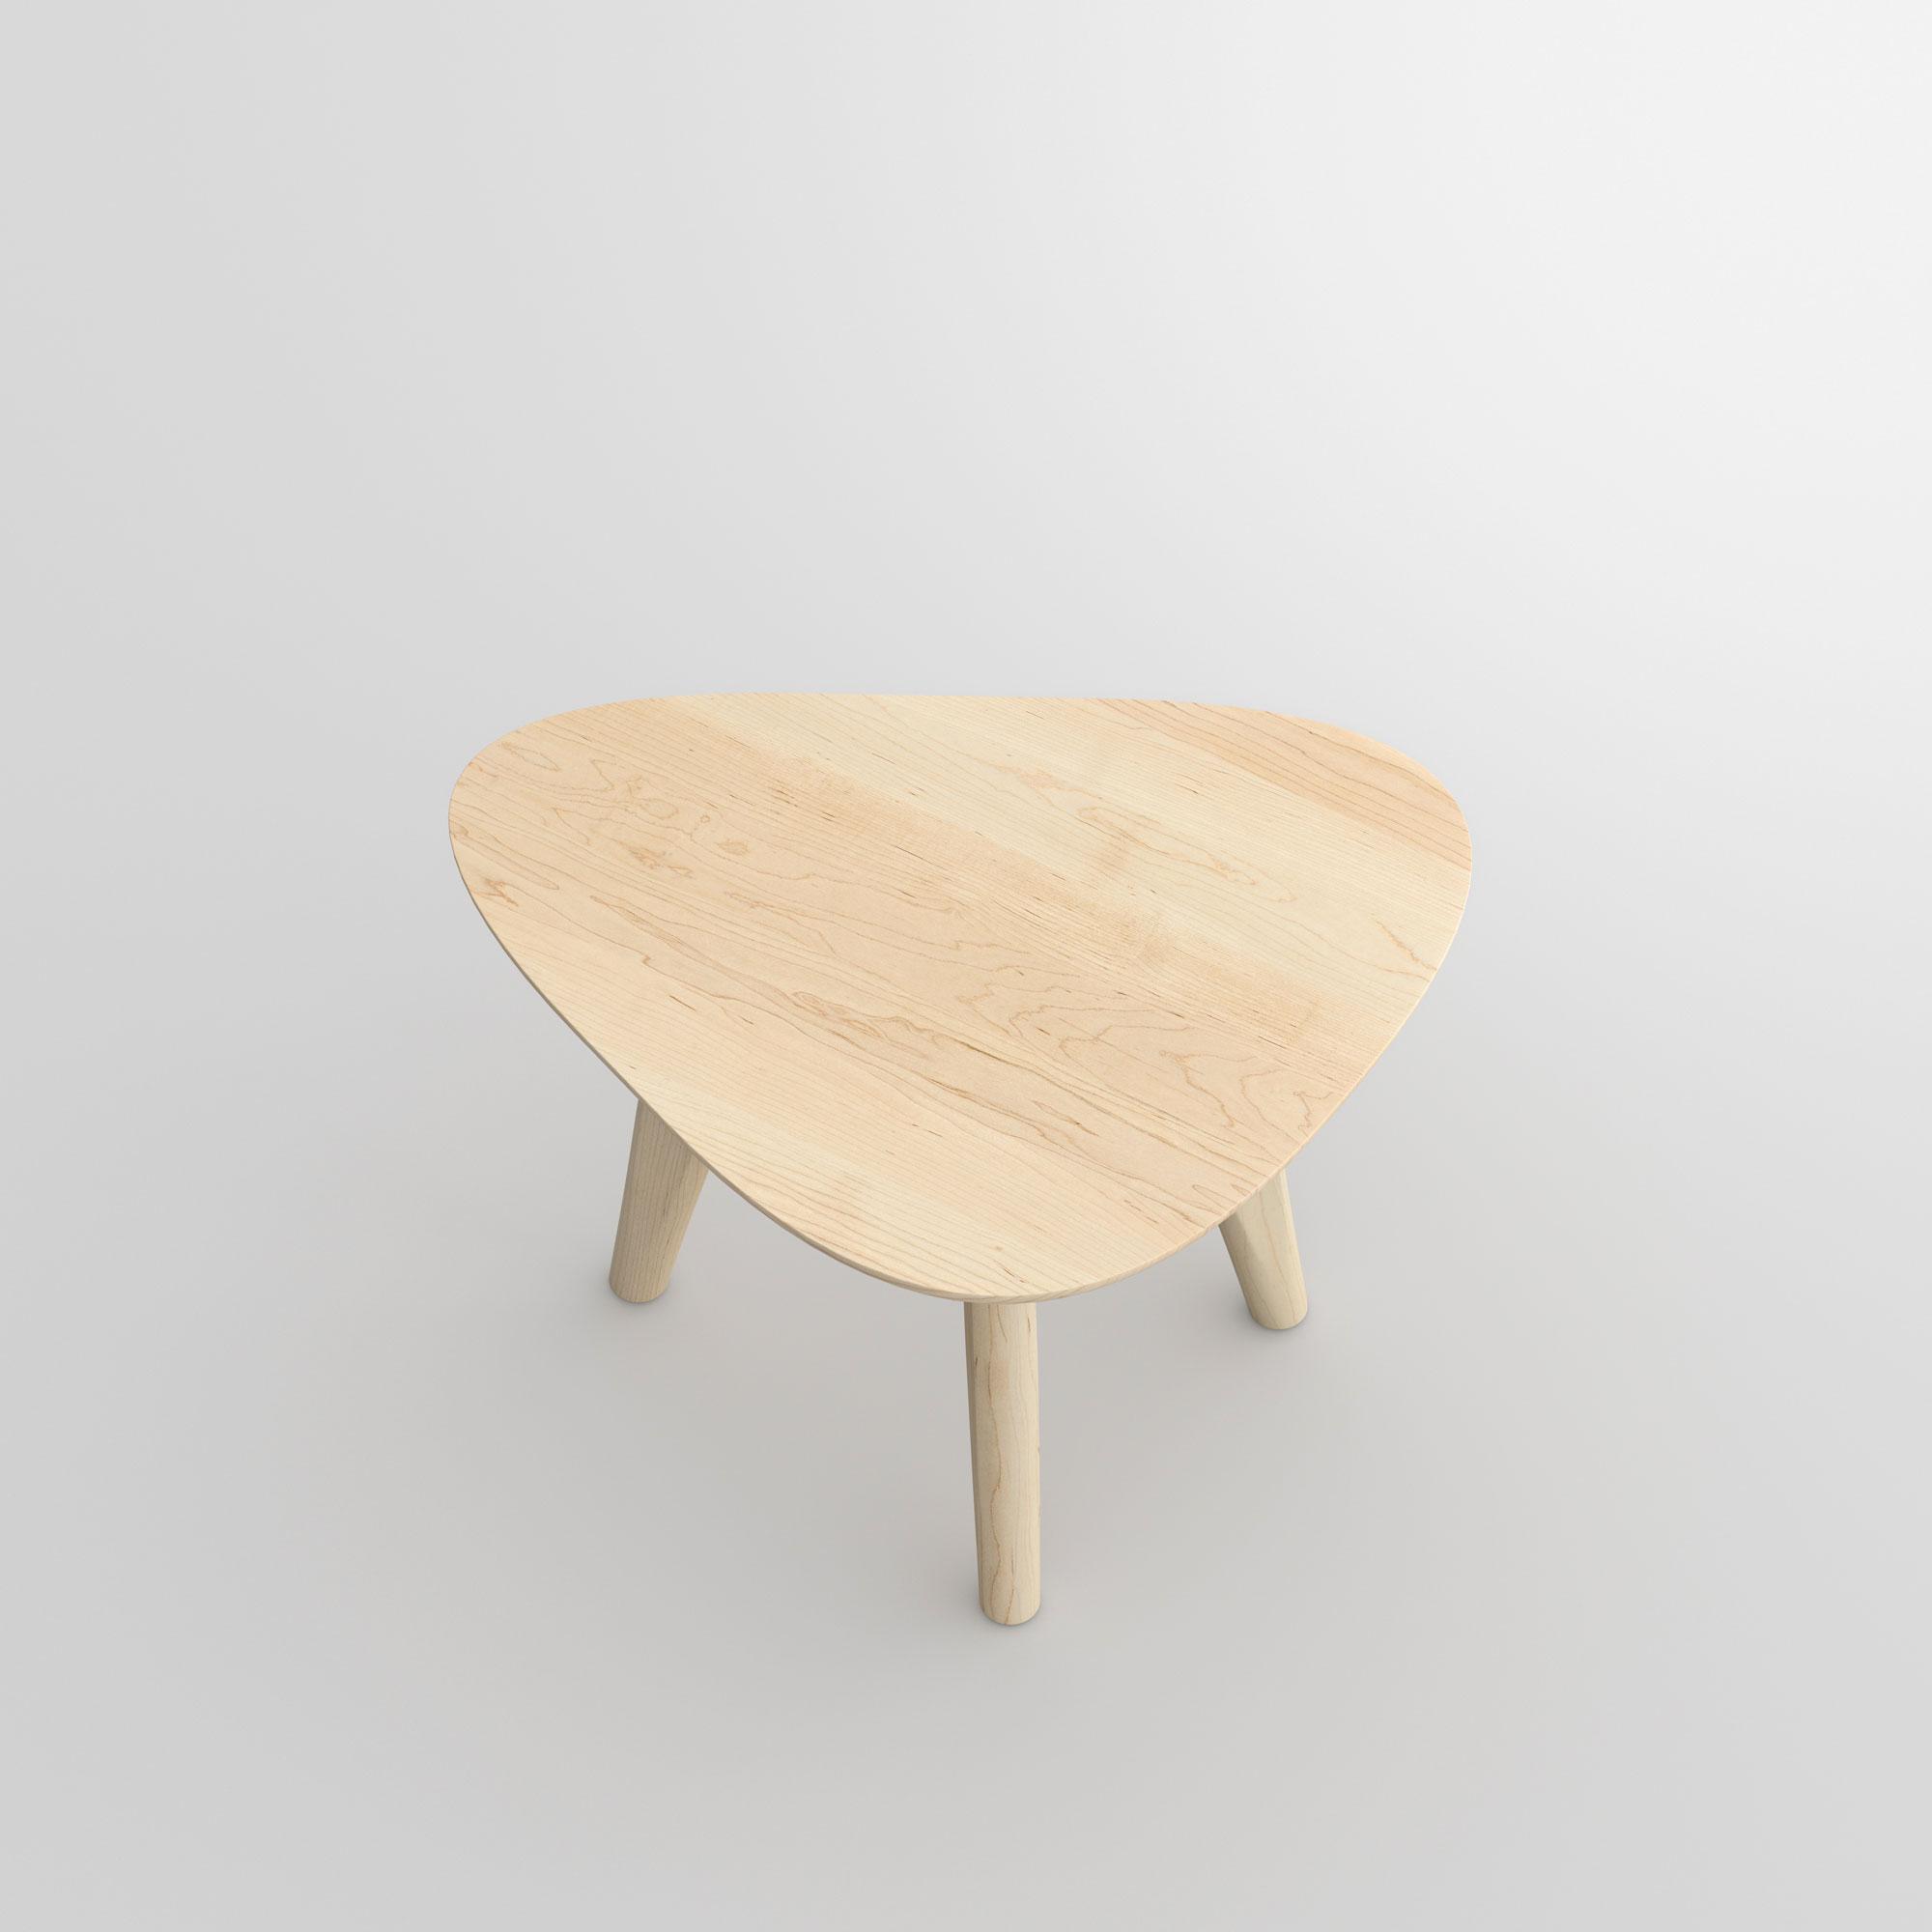 Nachttisch Holz Design. Fabulous Elegant Nachttisch Holz Kinder ...